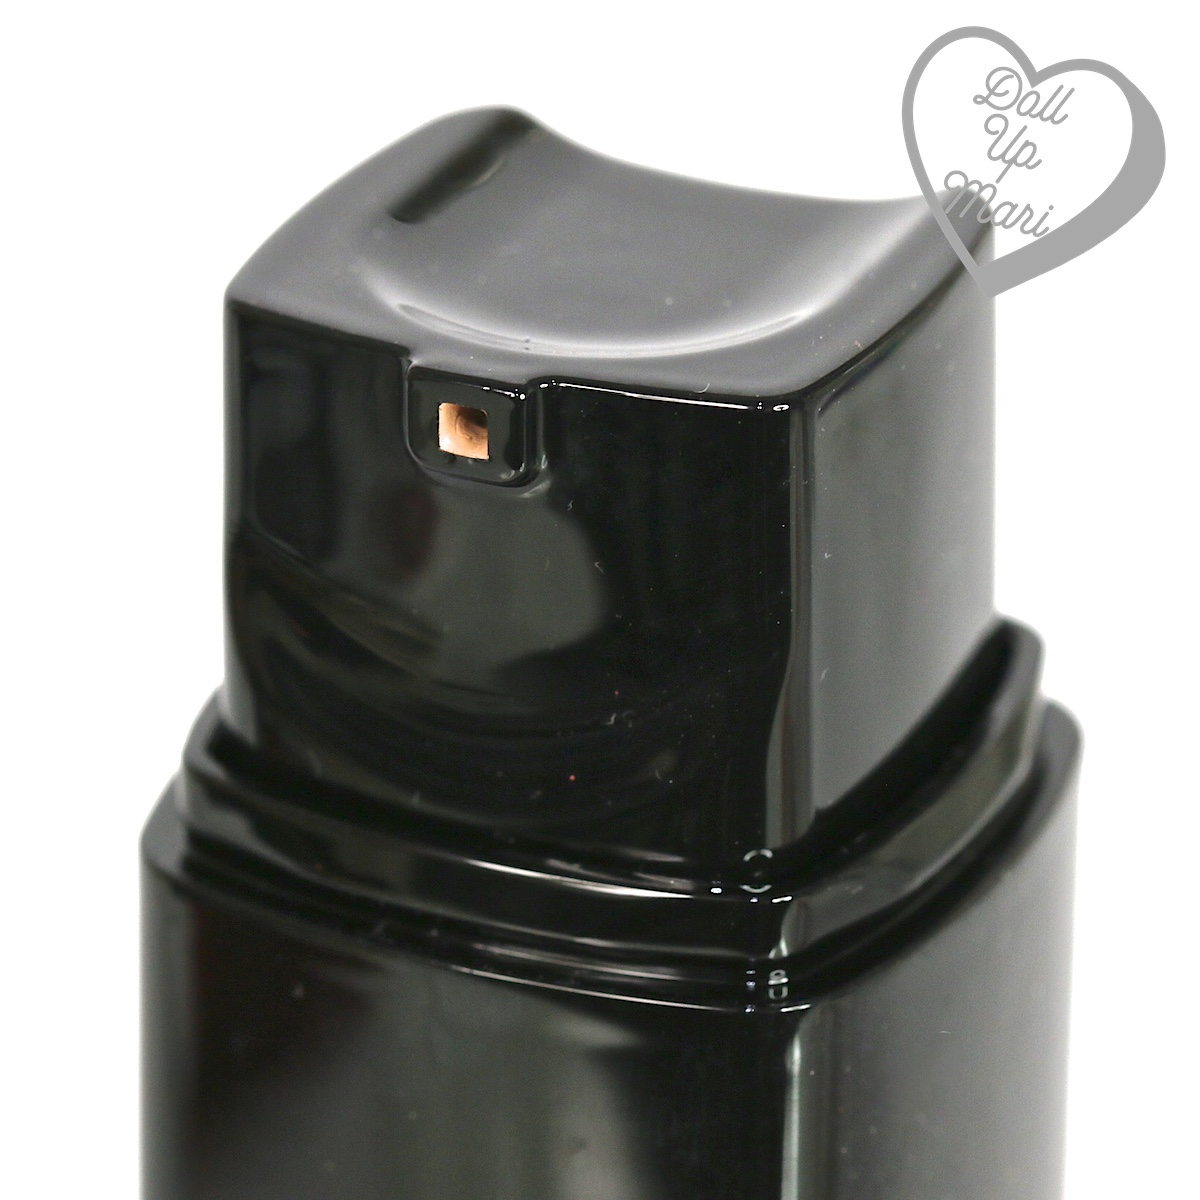 Applicator Pump of L'Oréal Paris Infallible 24HR Fresh Wear Liquid Foundation SPF25PA+++ in shade Golden Beige